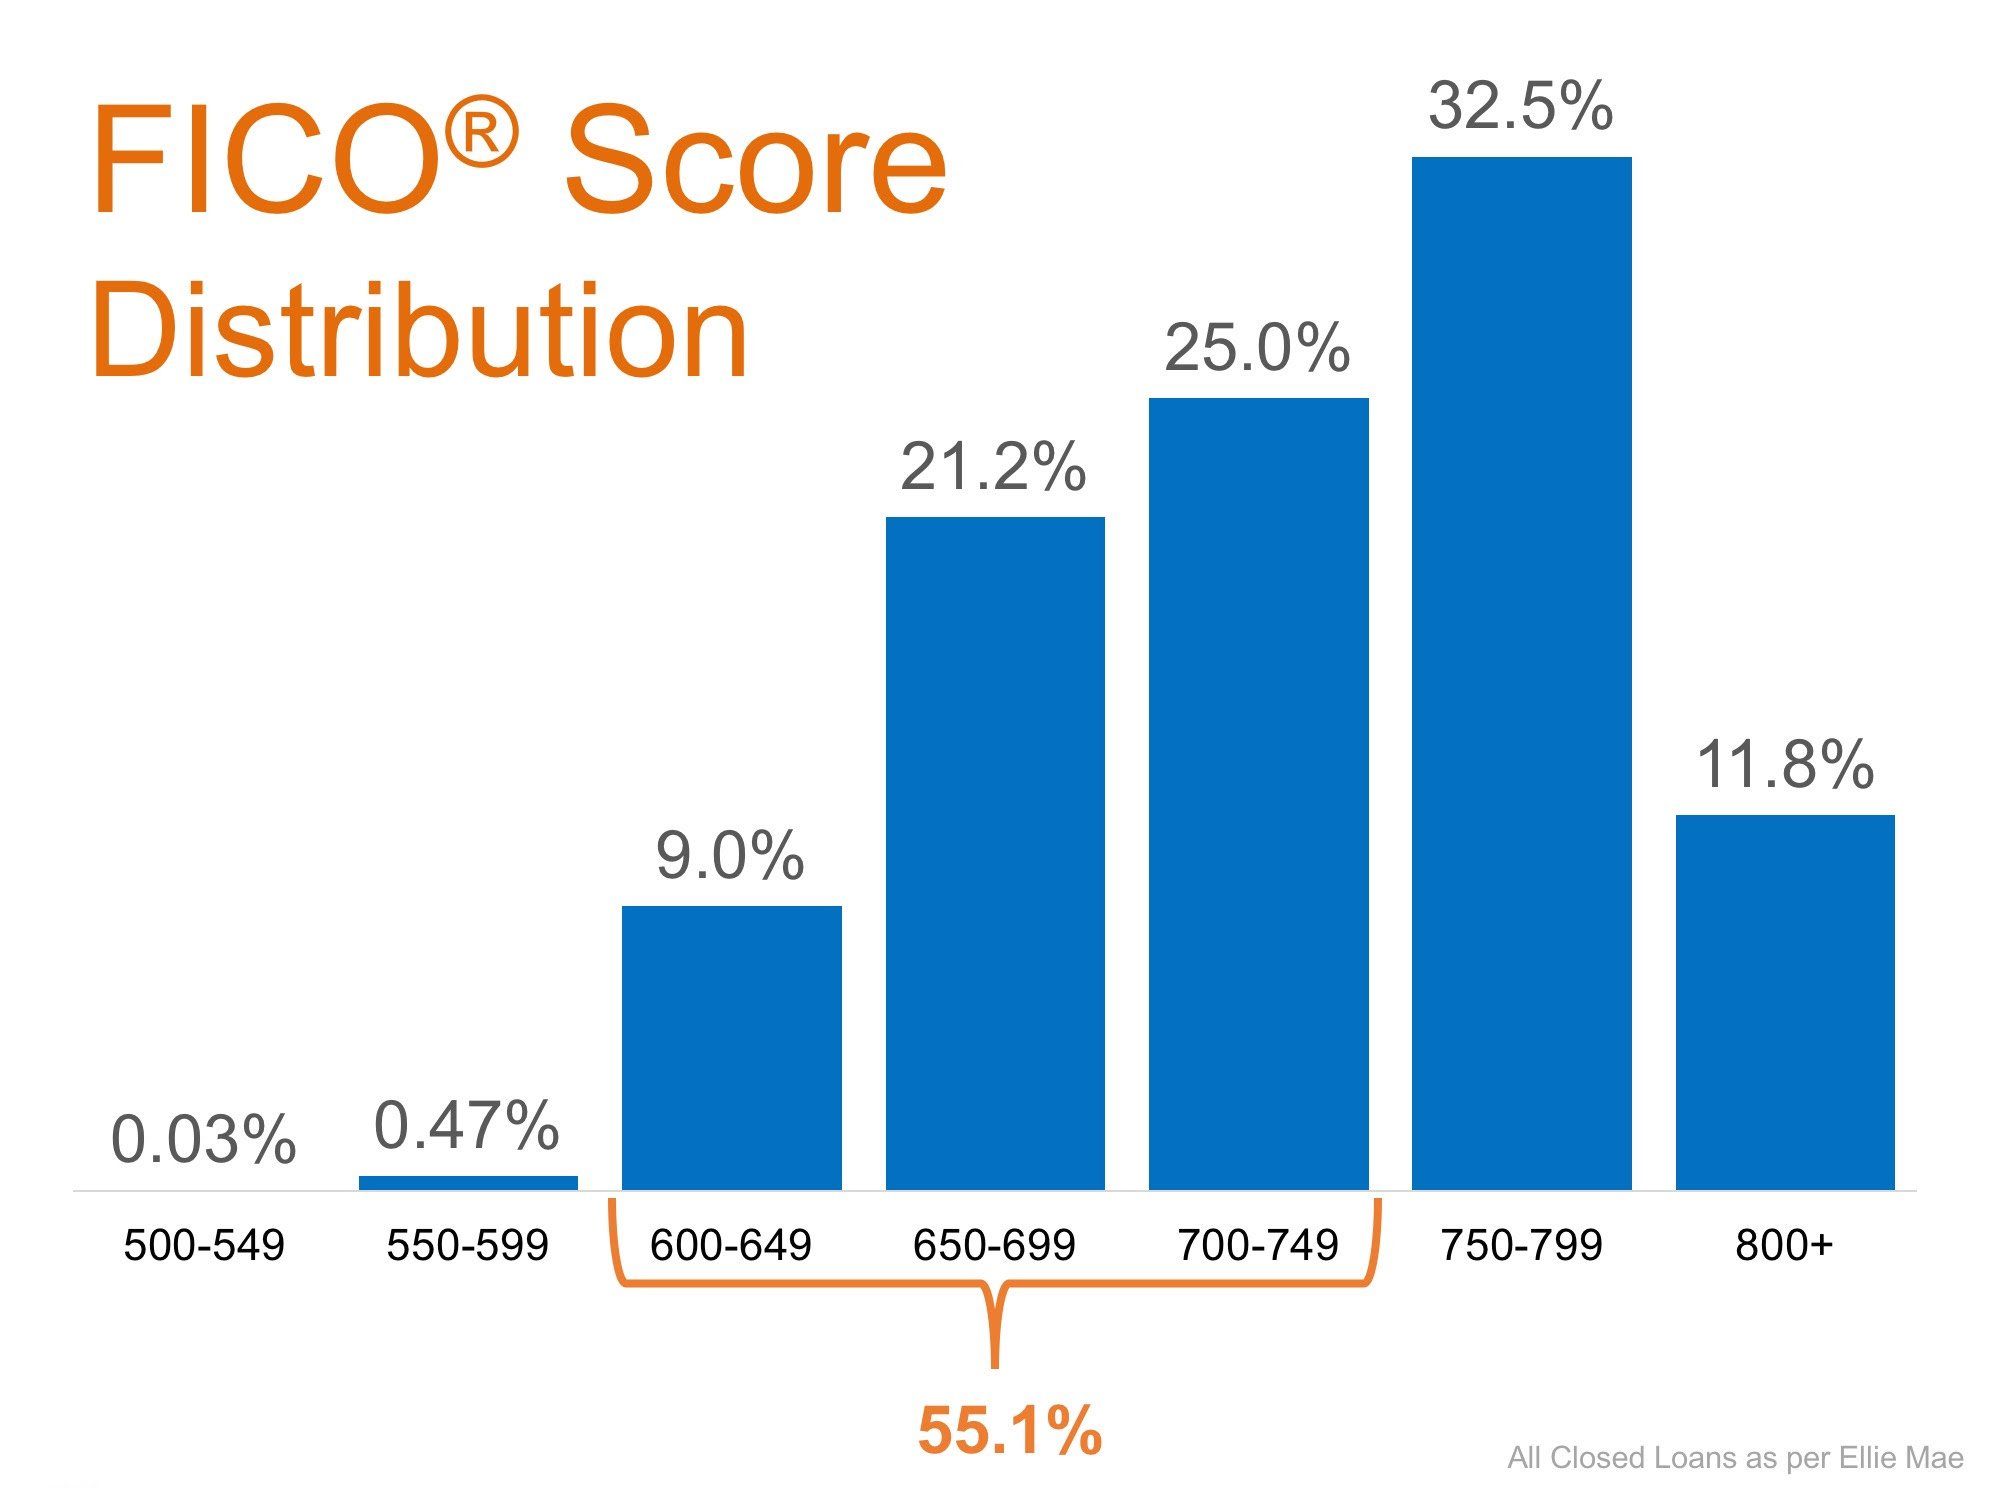 Eric Bell Estates Fico Score Distribution